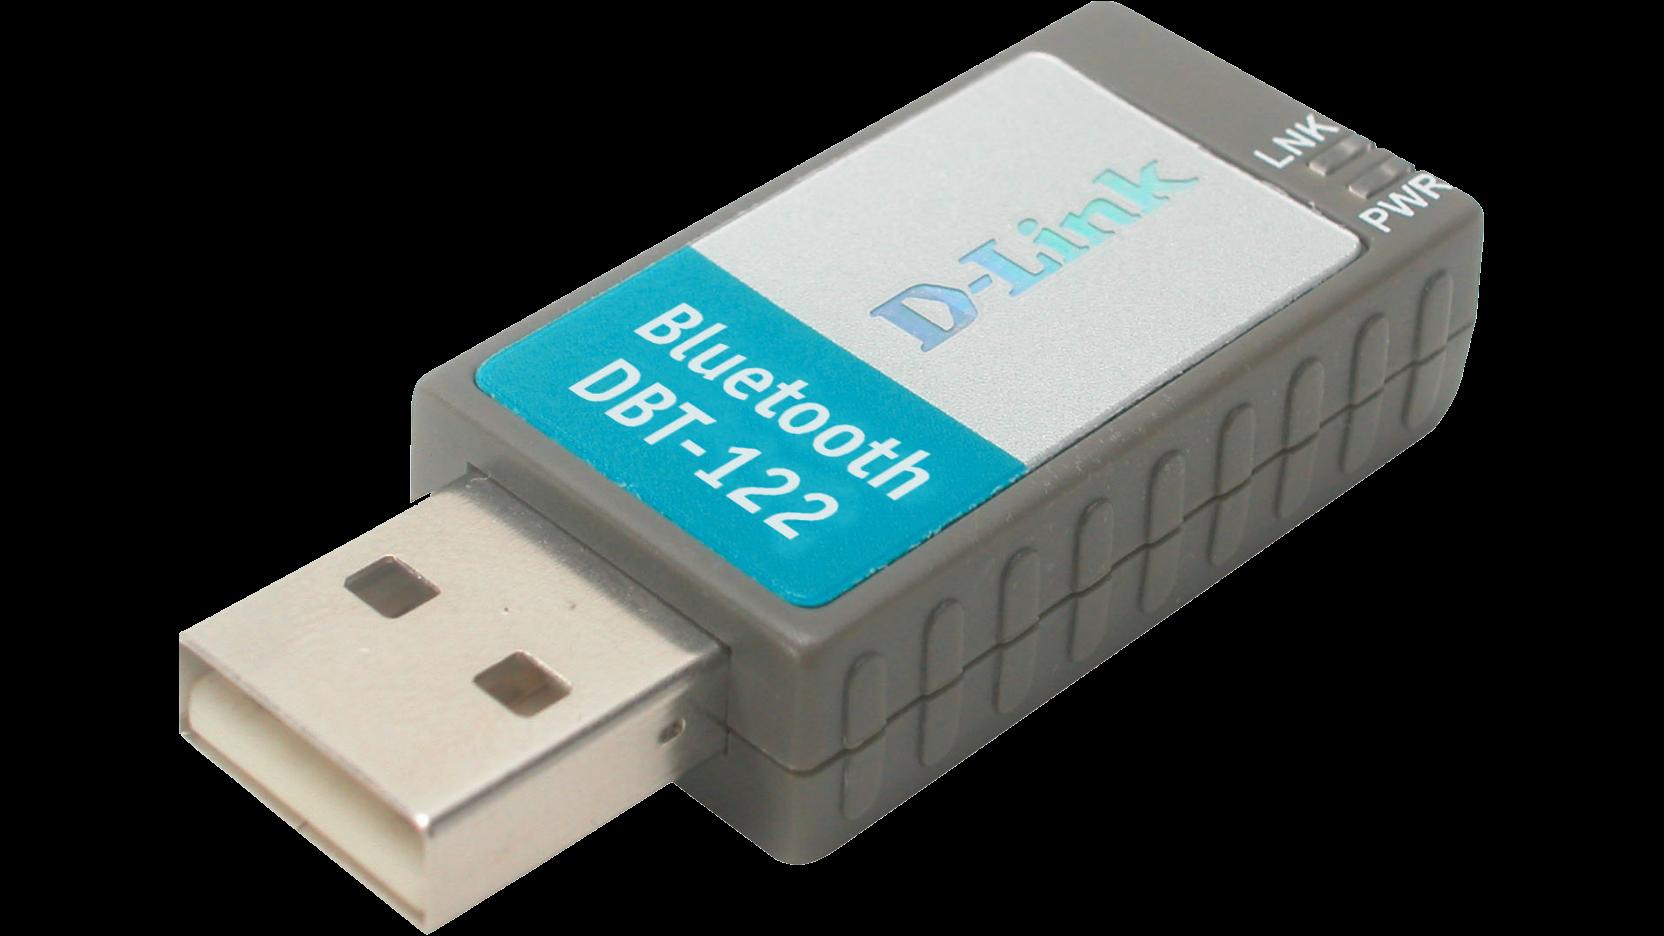 DBT-120 WIRELESS BLUETOOTH 2.0 USB ADAPTER WINDOWS VISTA DRIVER DOWNLOAD